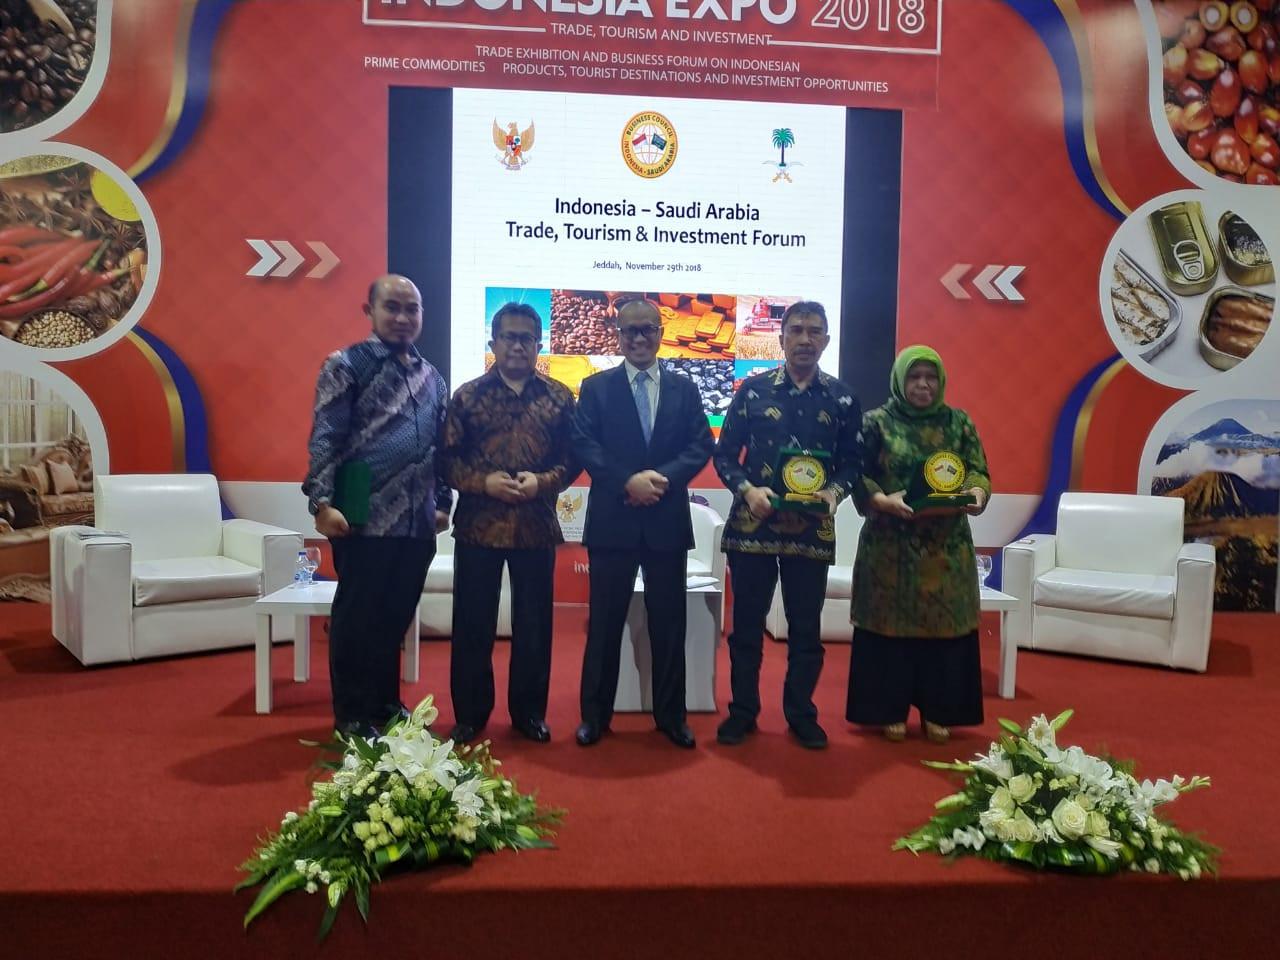 Indoensian Expo 2018